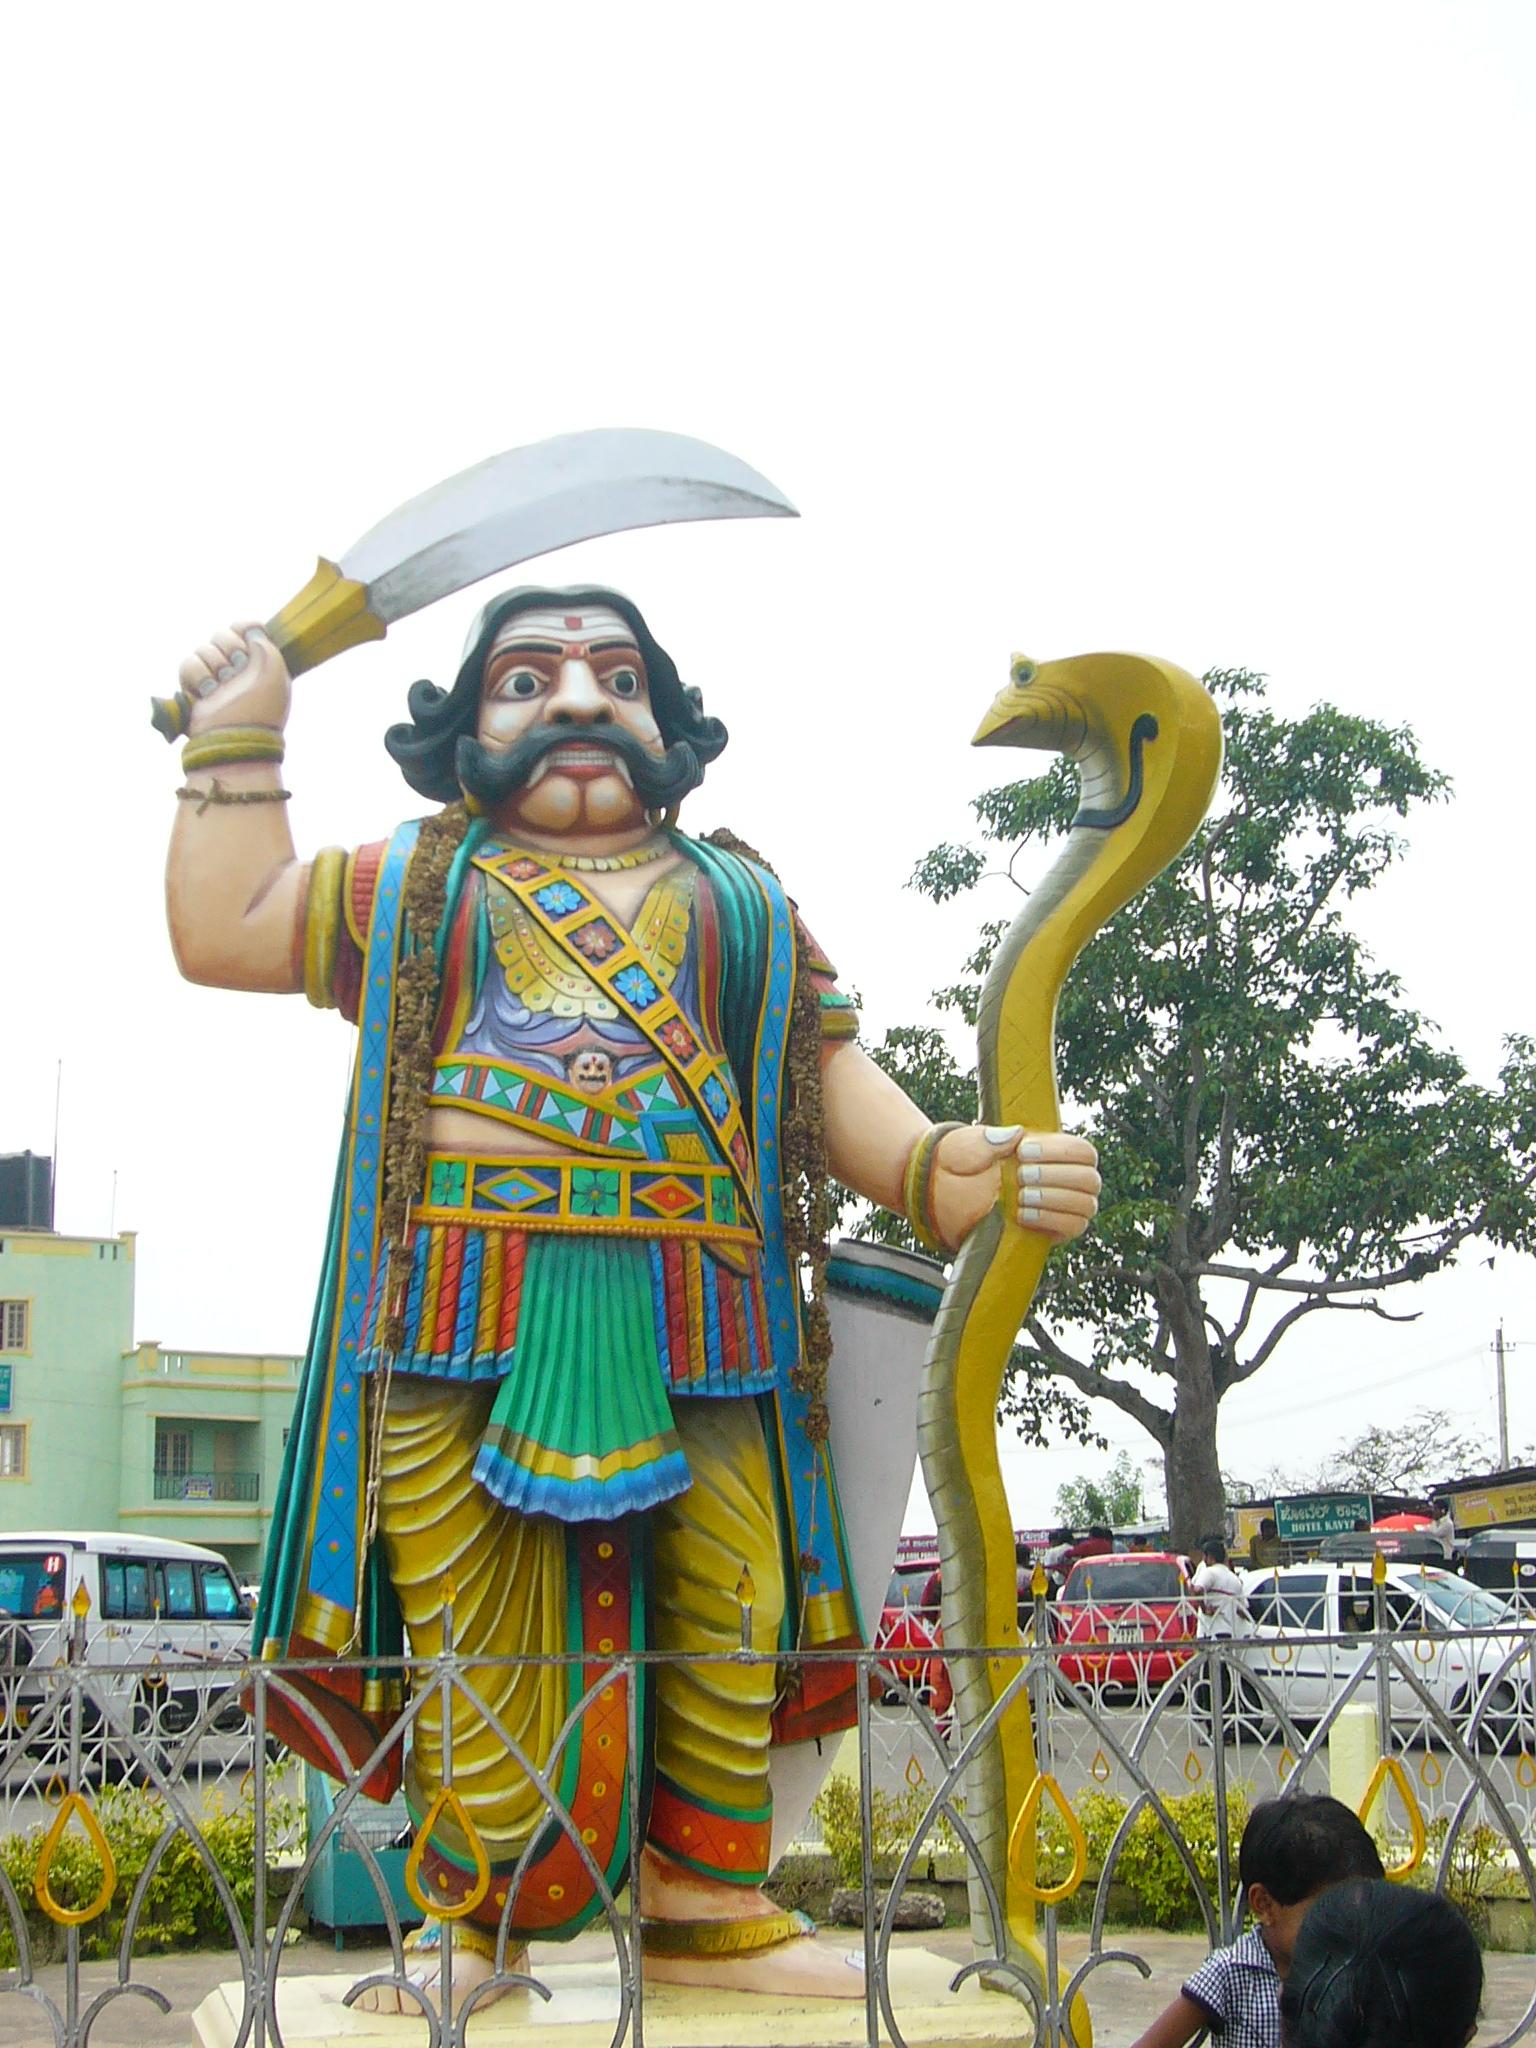 File:Mahishasura Statue Chamundesvari Temple - Uploaded By Debpratim De.JPG